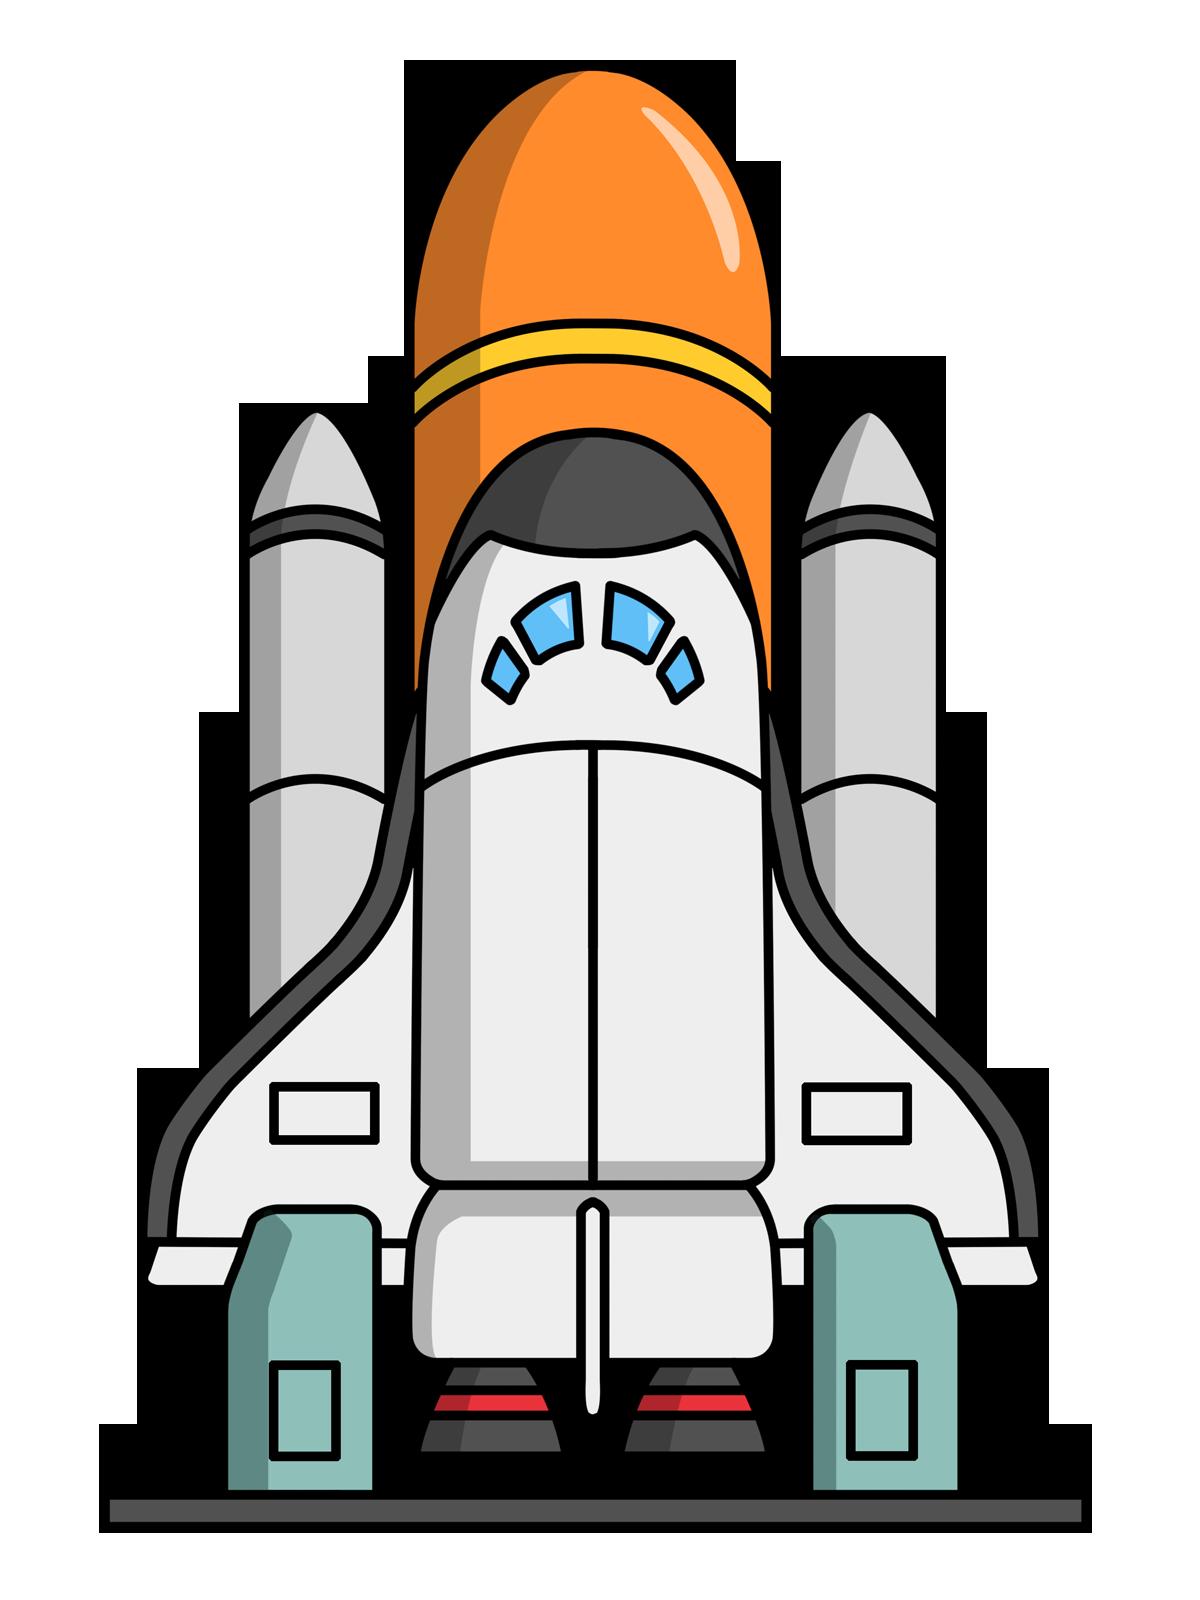 Space shuttle desktop clipart.